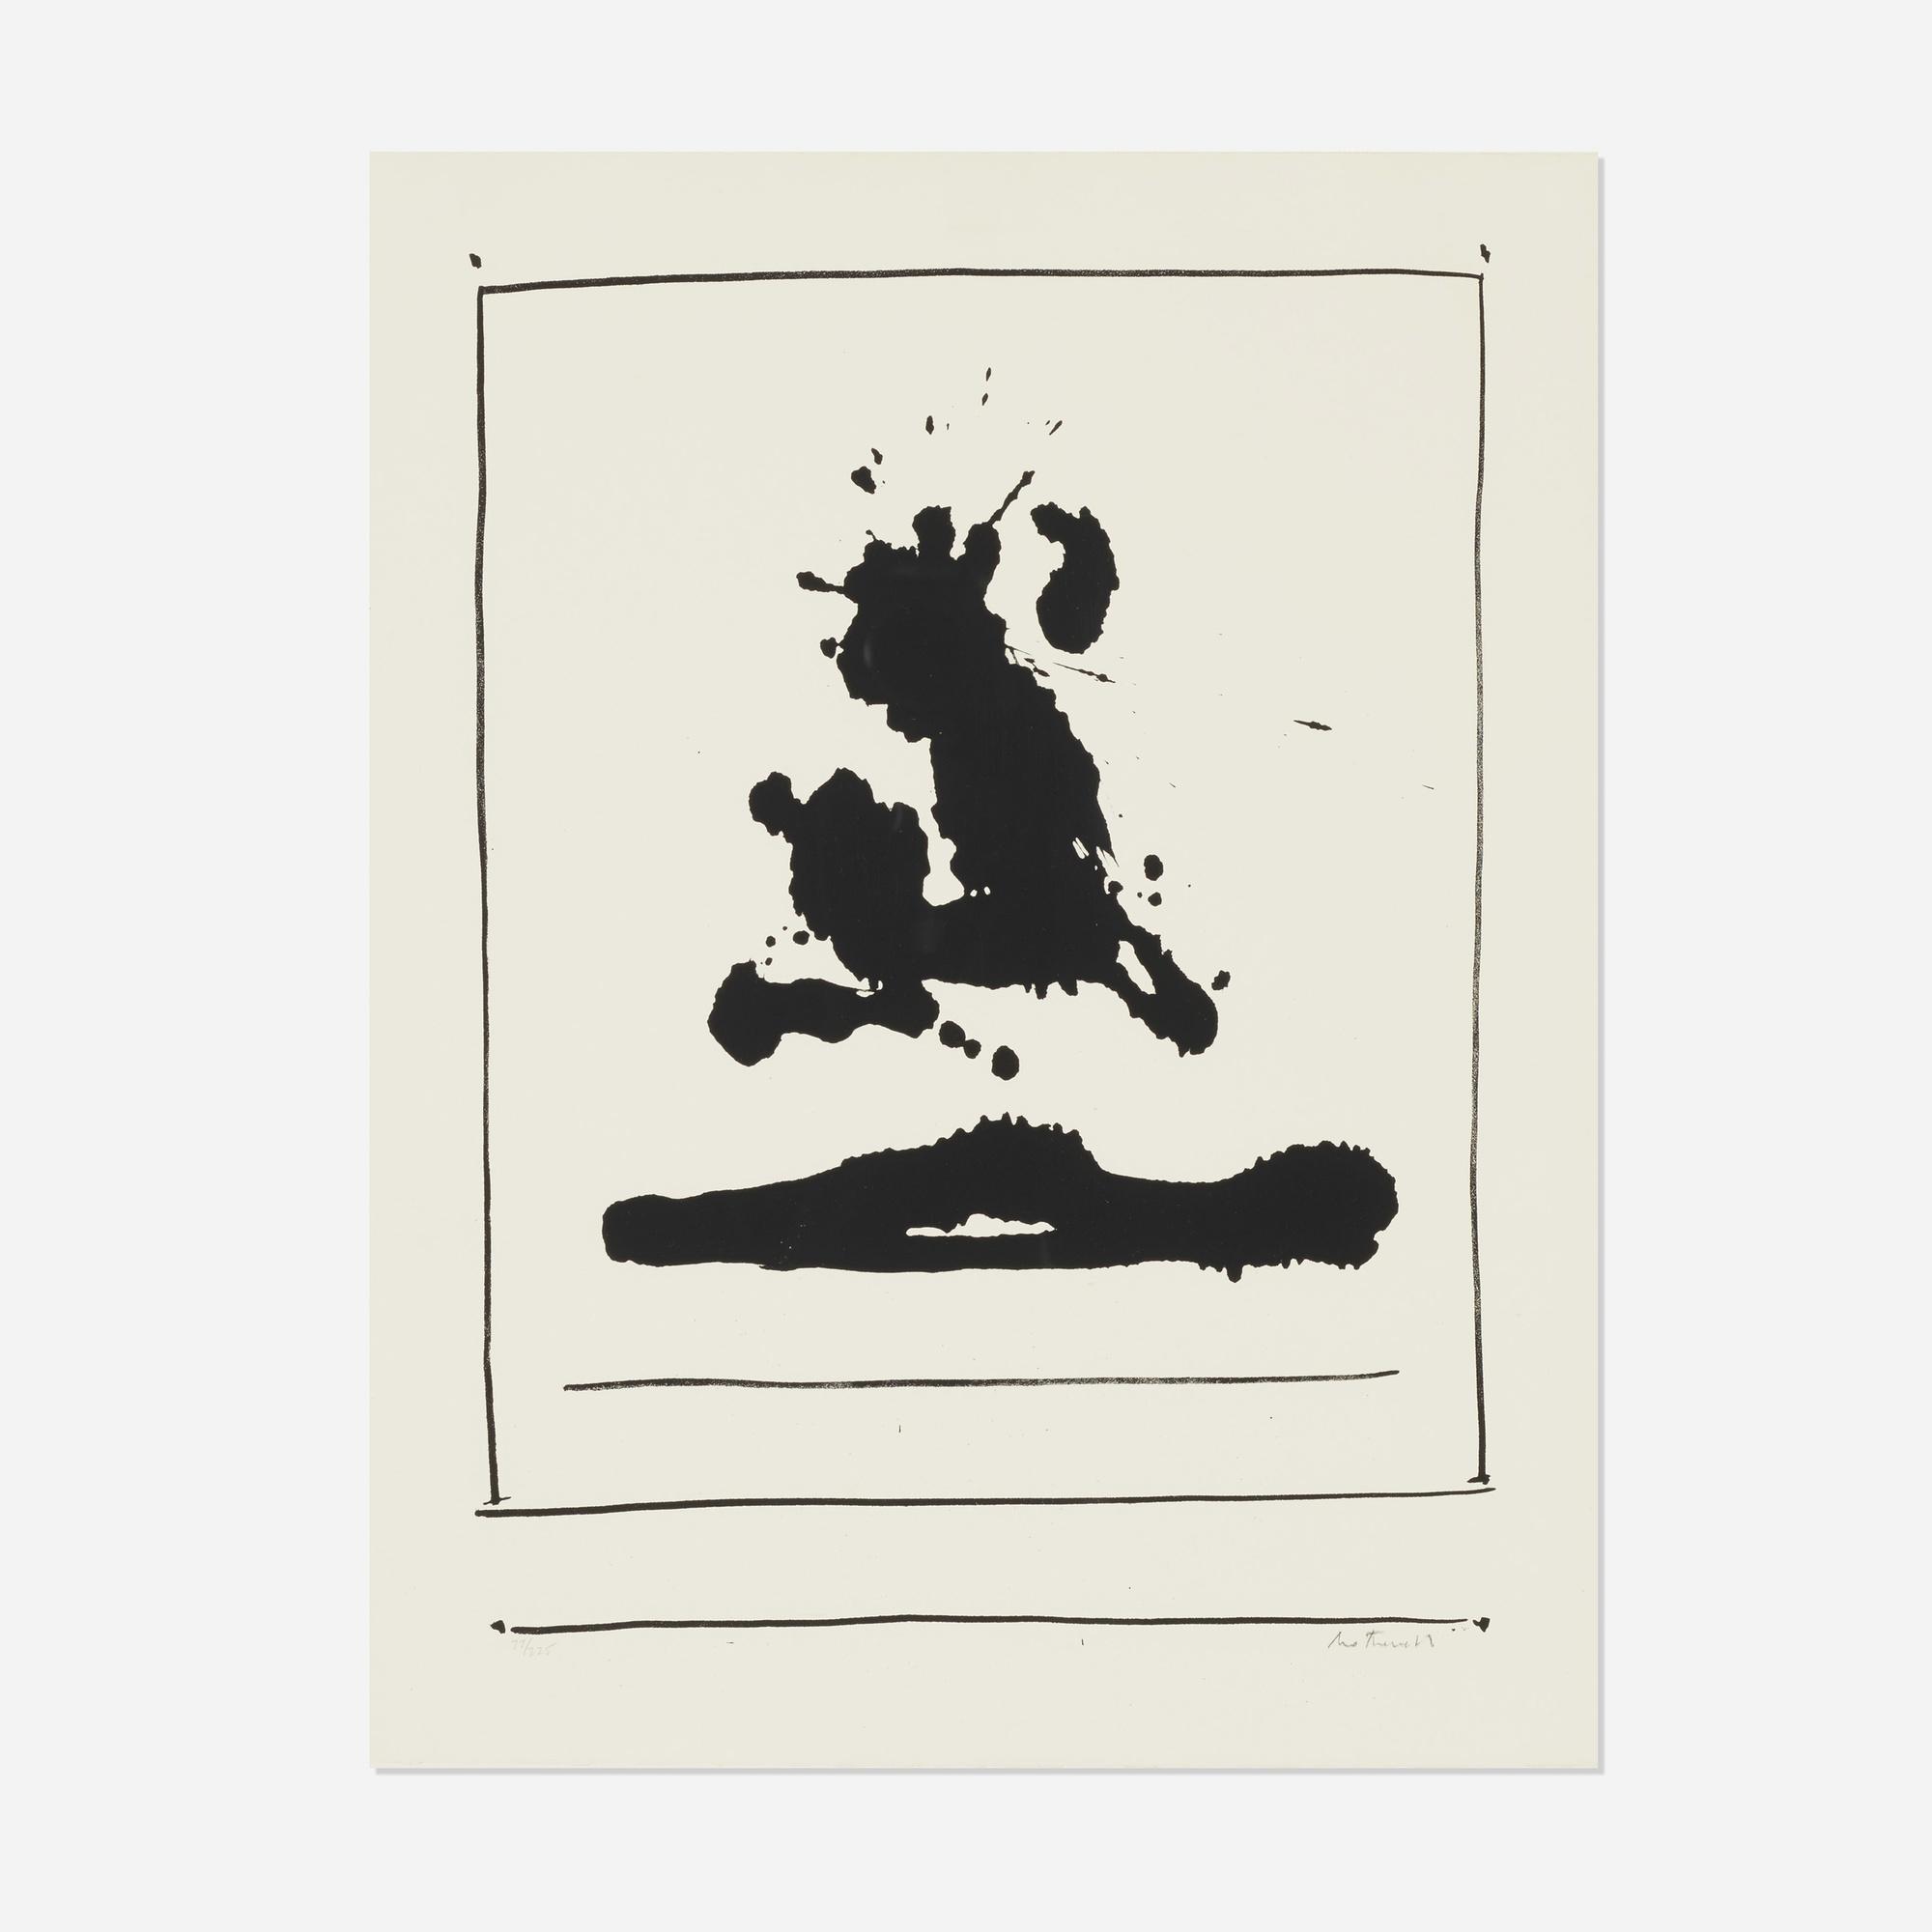 206: Robert Motherwell / New York International: Untitled (1 of 1)